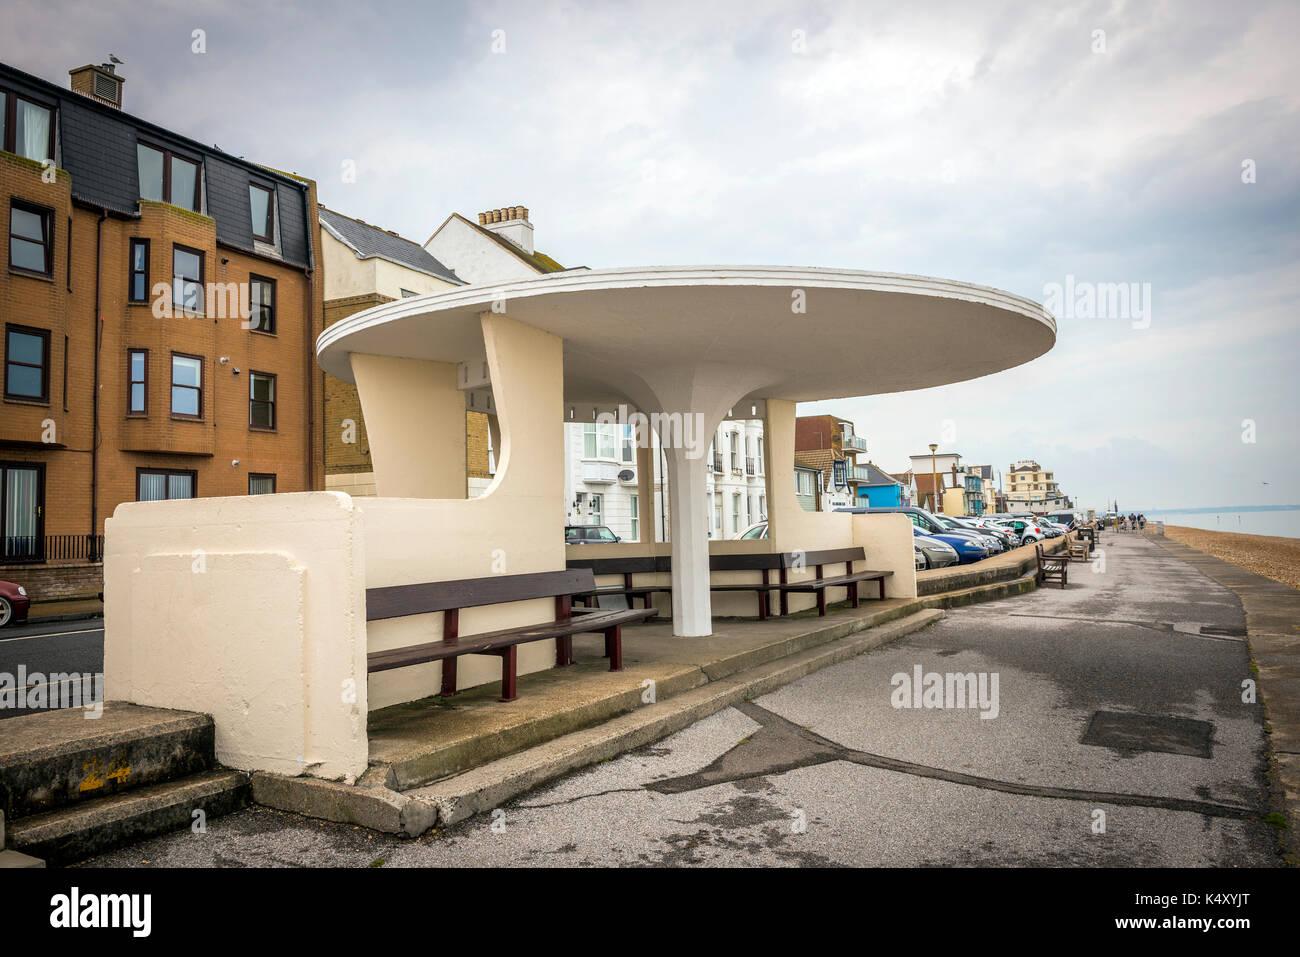 Interesting shelter on Deal Seafront, Kent, UK - Stock Image